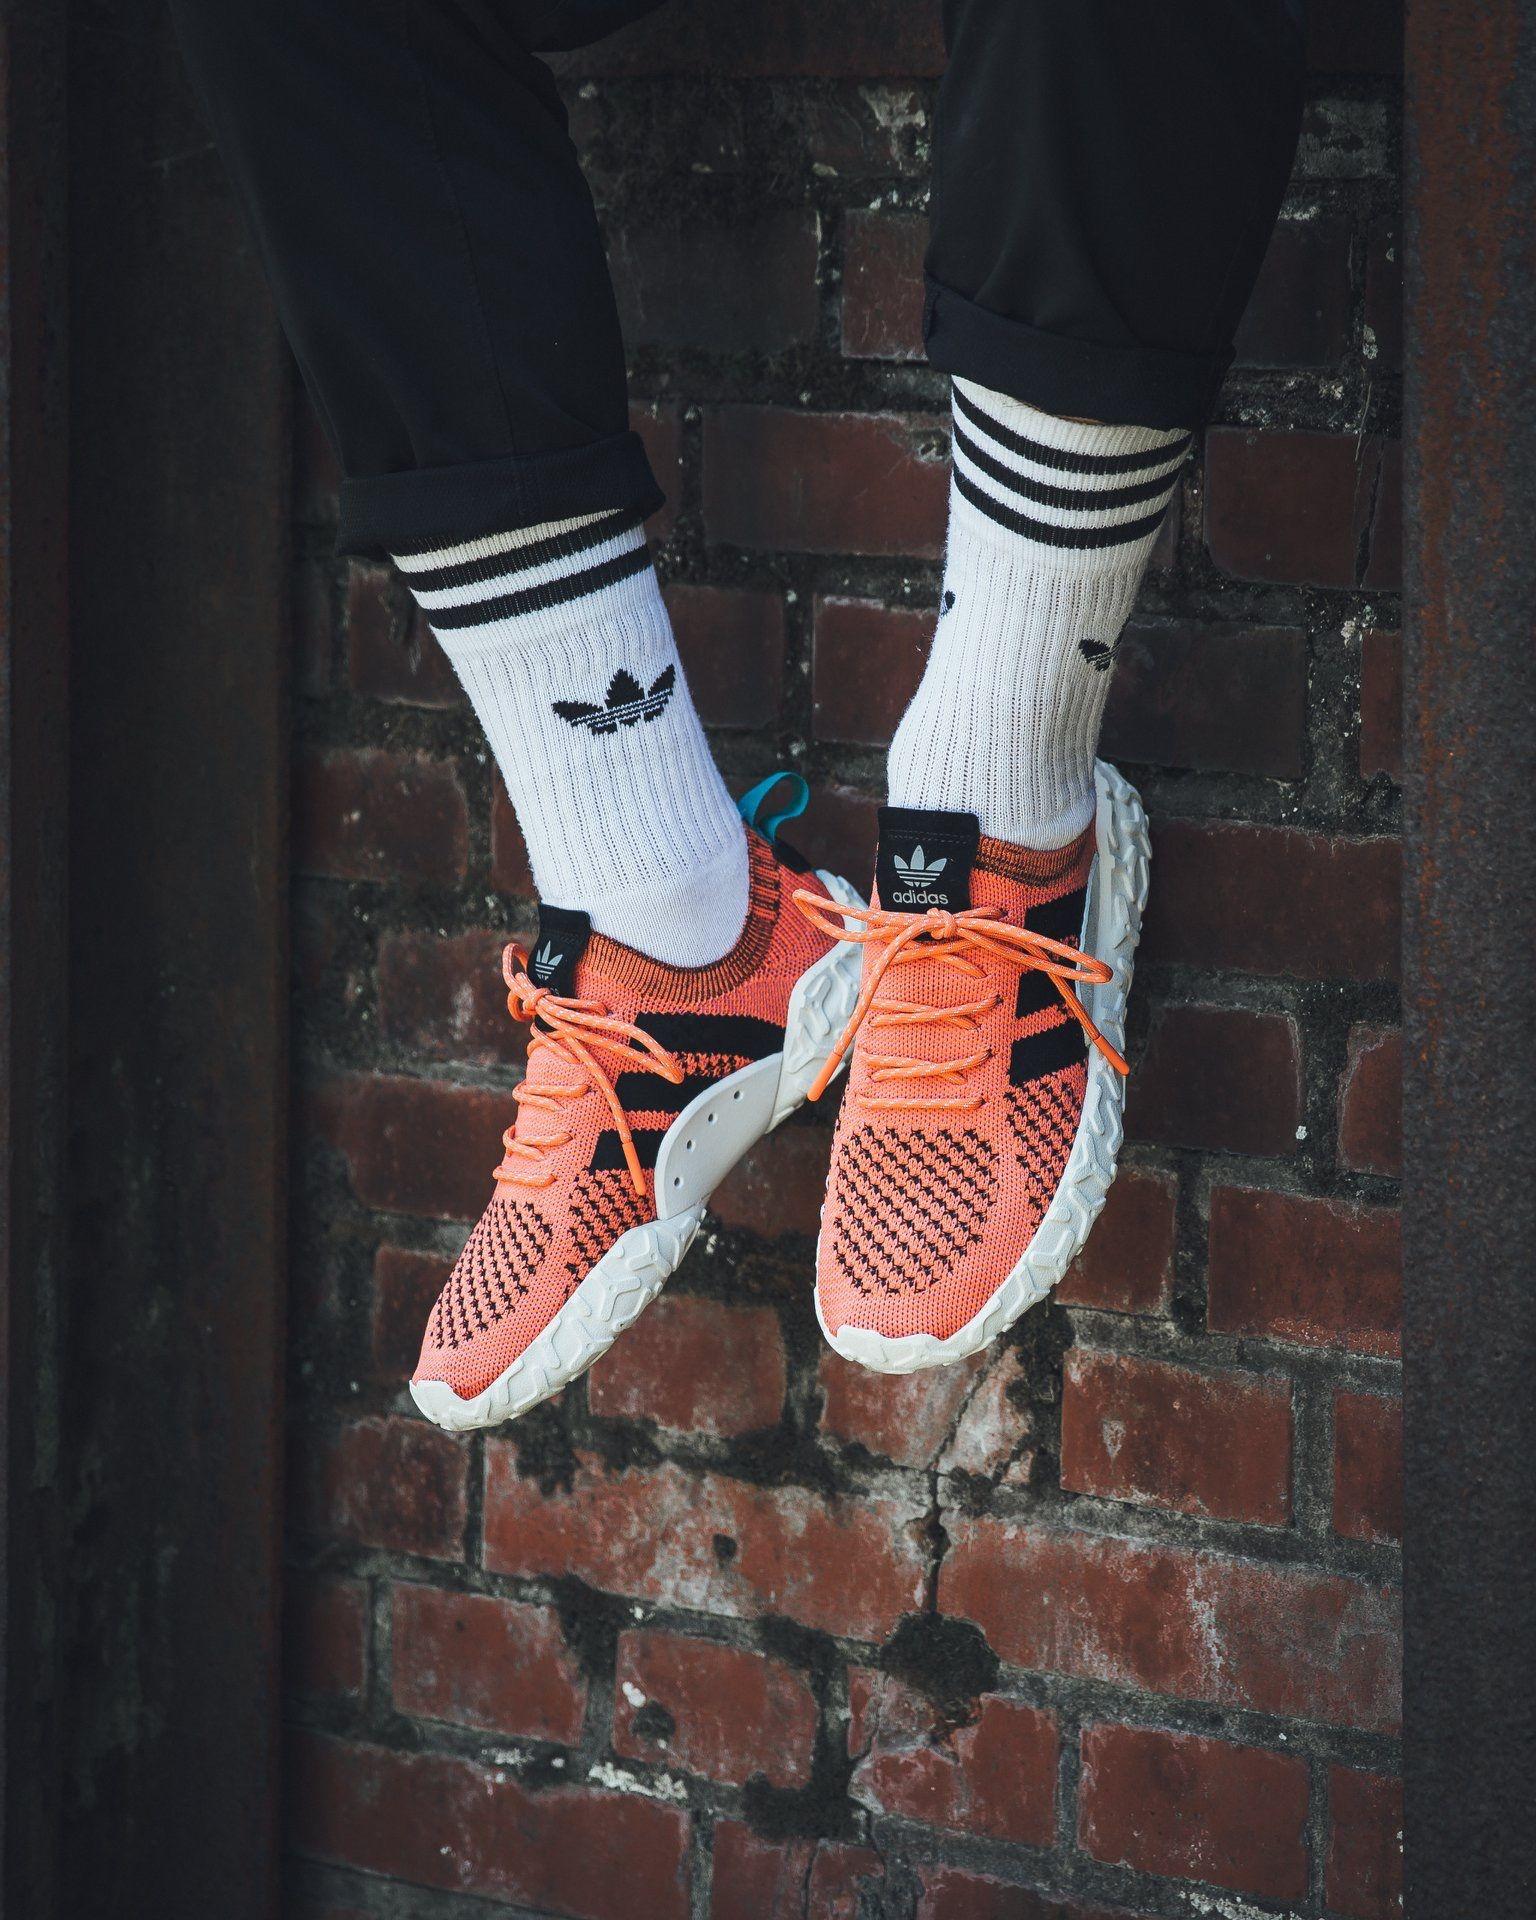 Humanista Contratista antepasado  Athletic Shoes Adidas Originals Men's F/22 Primeknit Shoes Sneakers Orange  CQ3027 Clothing, Shoes & Accessories bailek.com